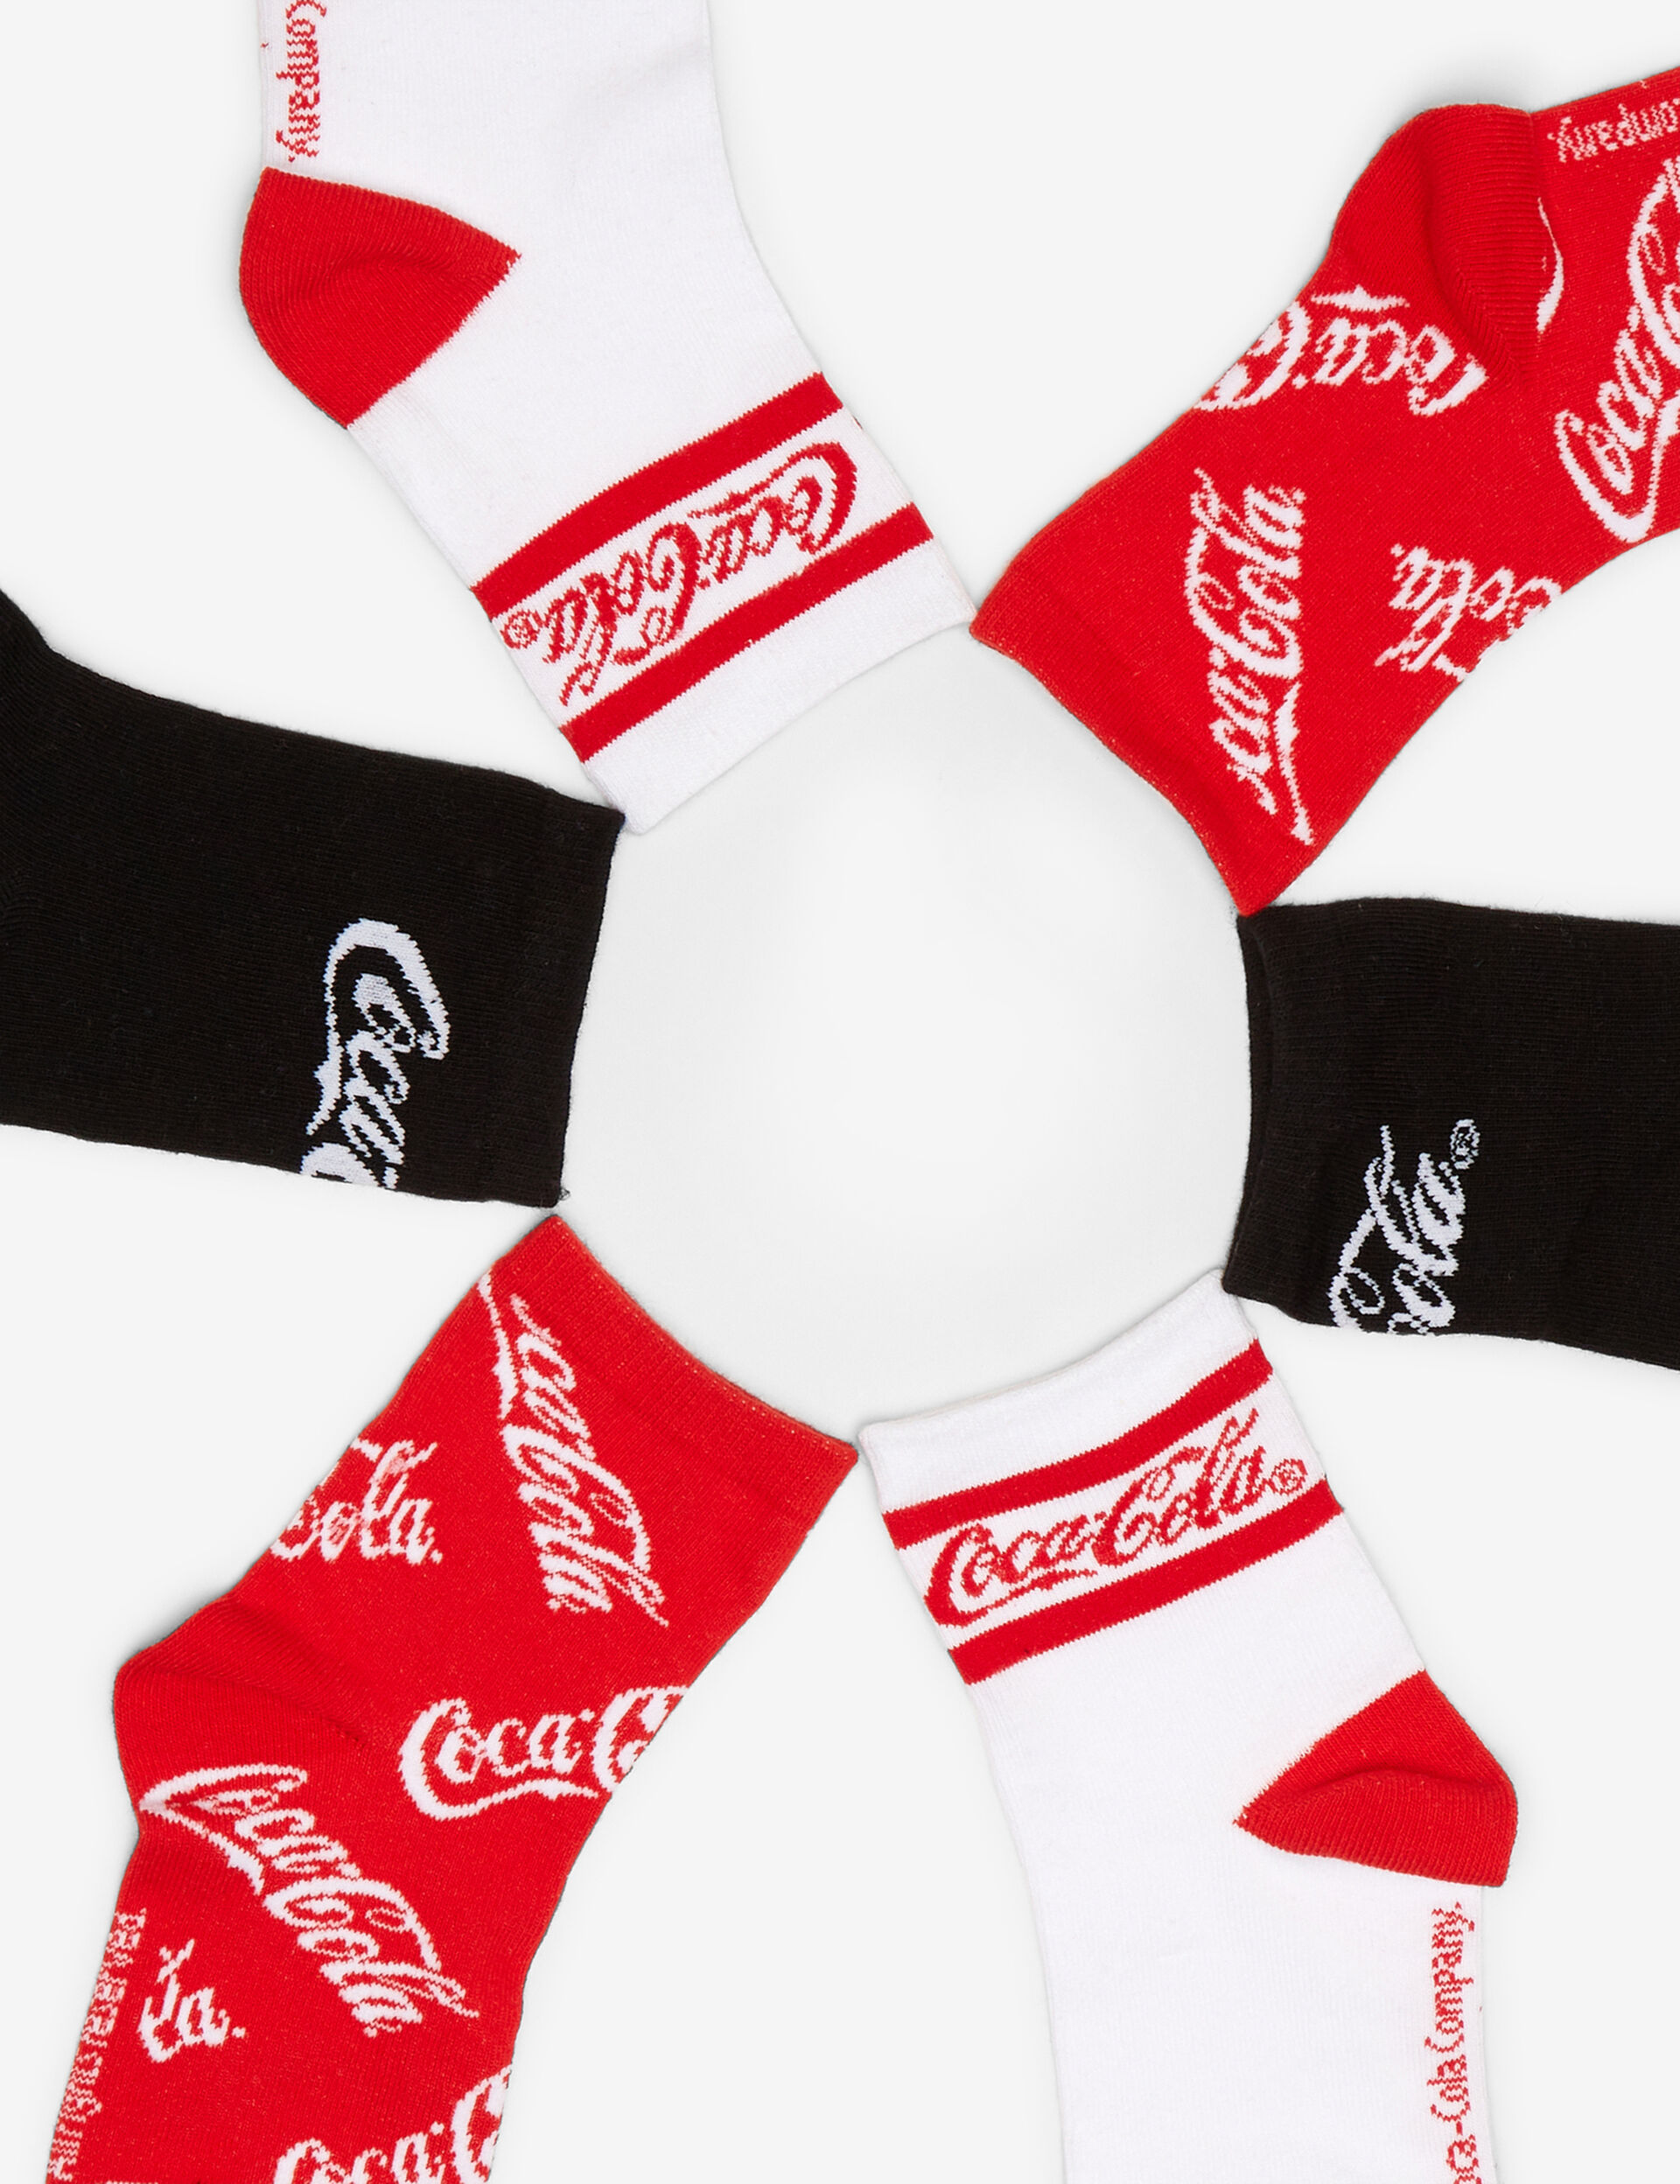 Coca-Cola socks